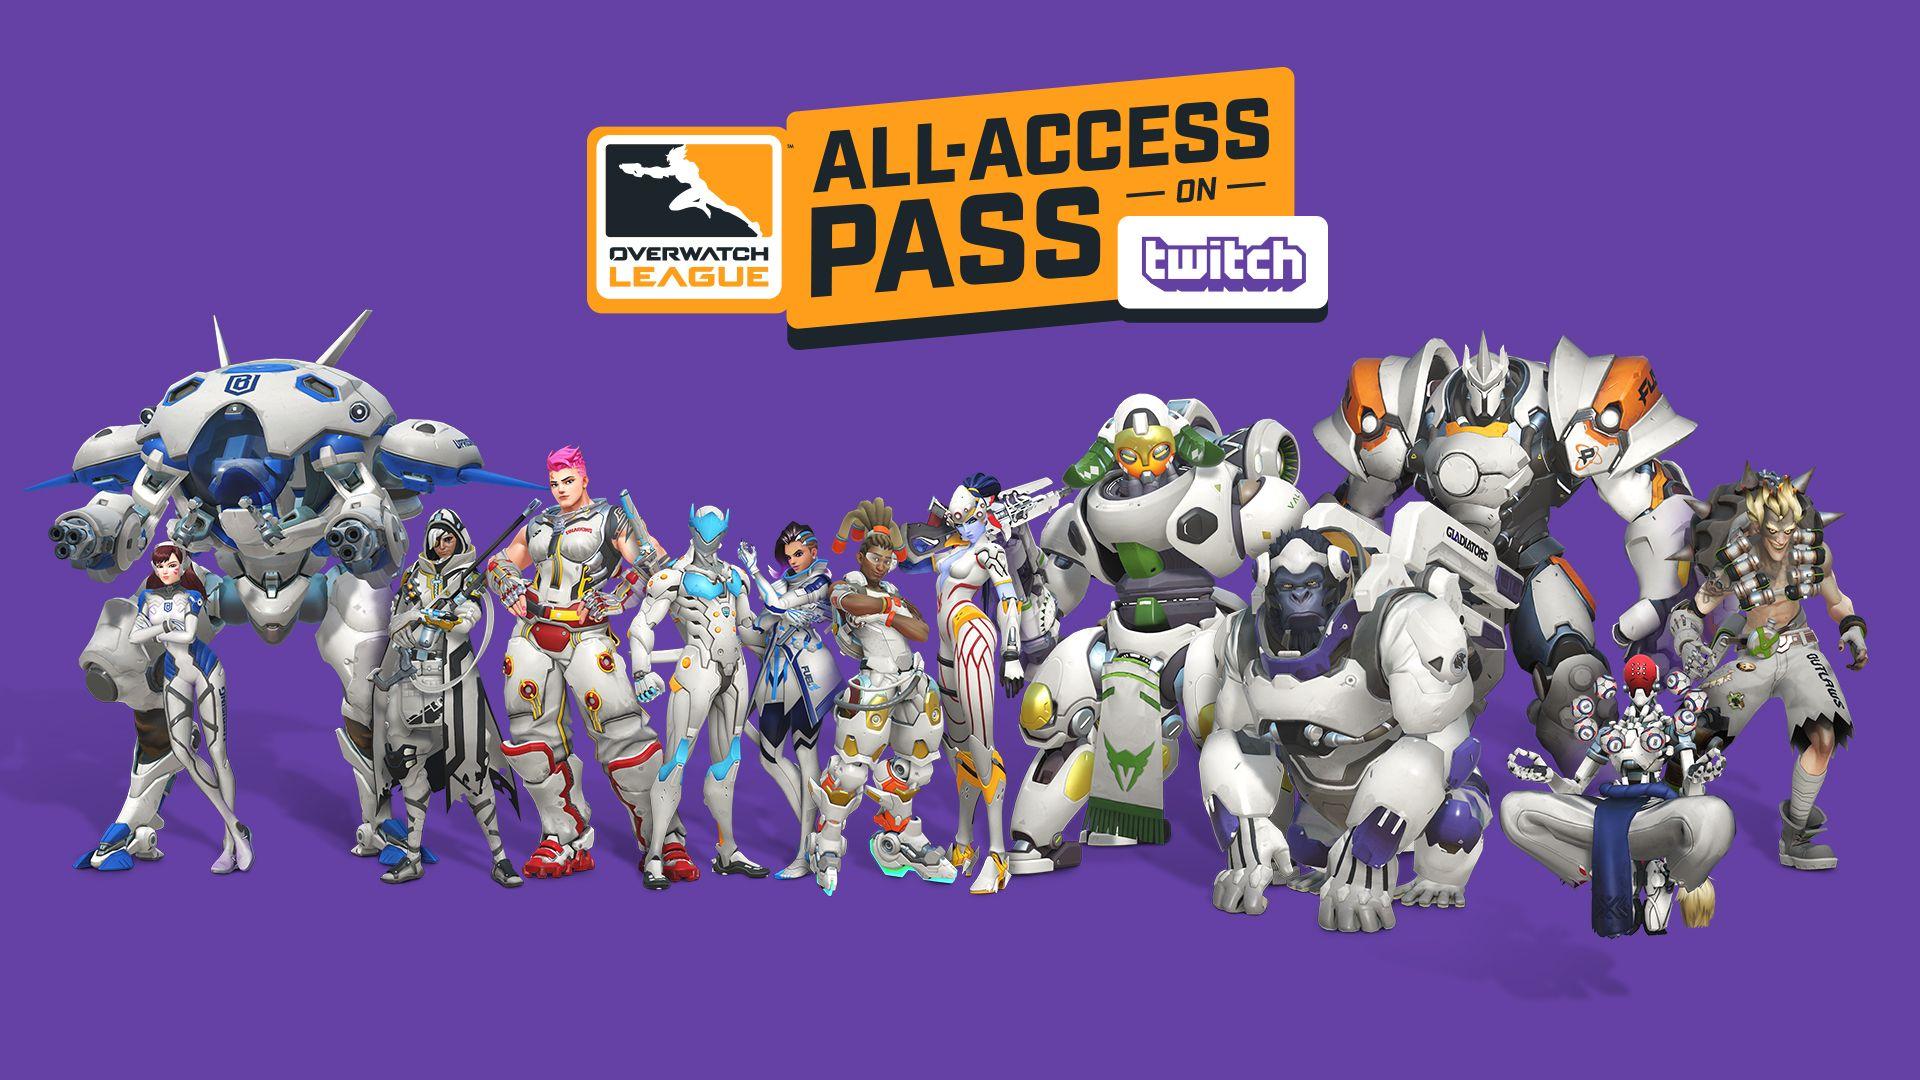 overwatch, league, away, skins, twitch, pass